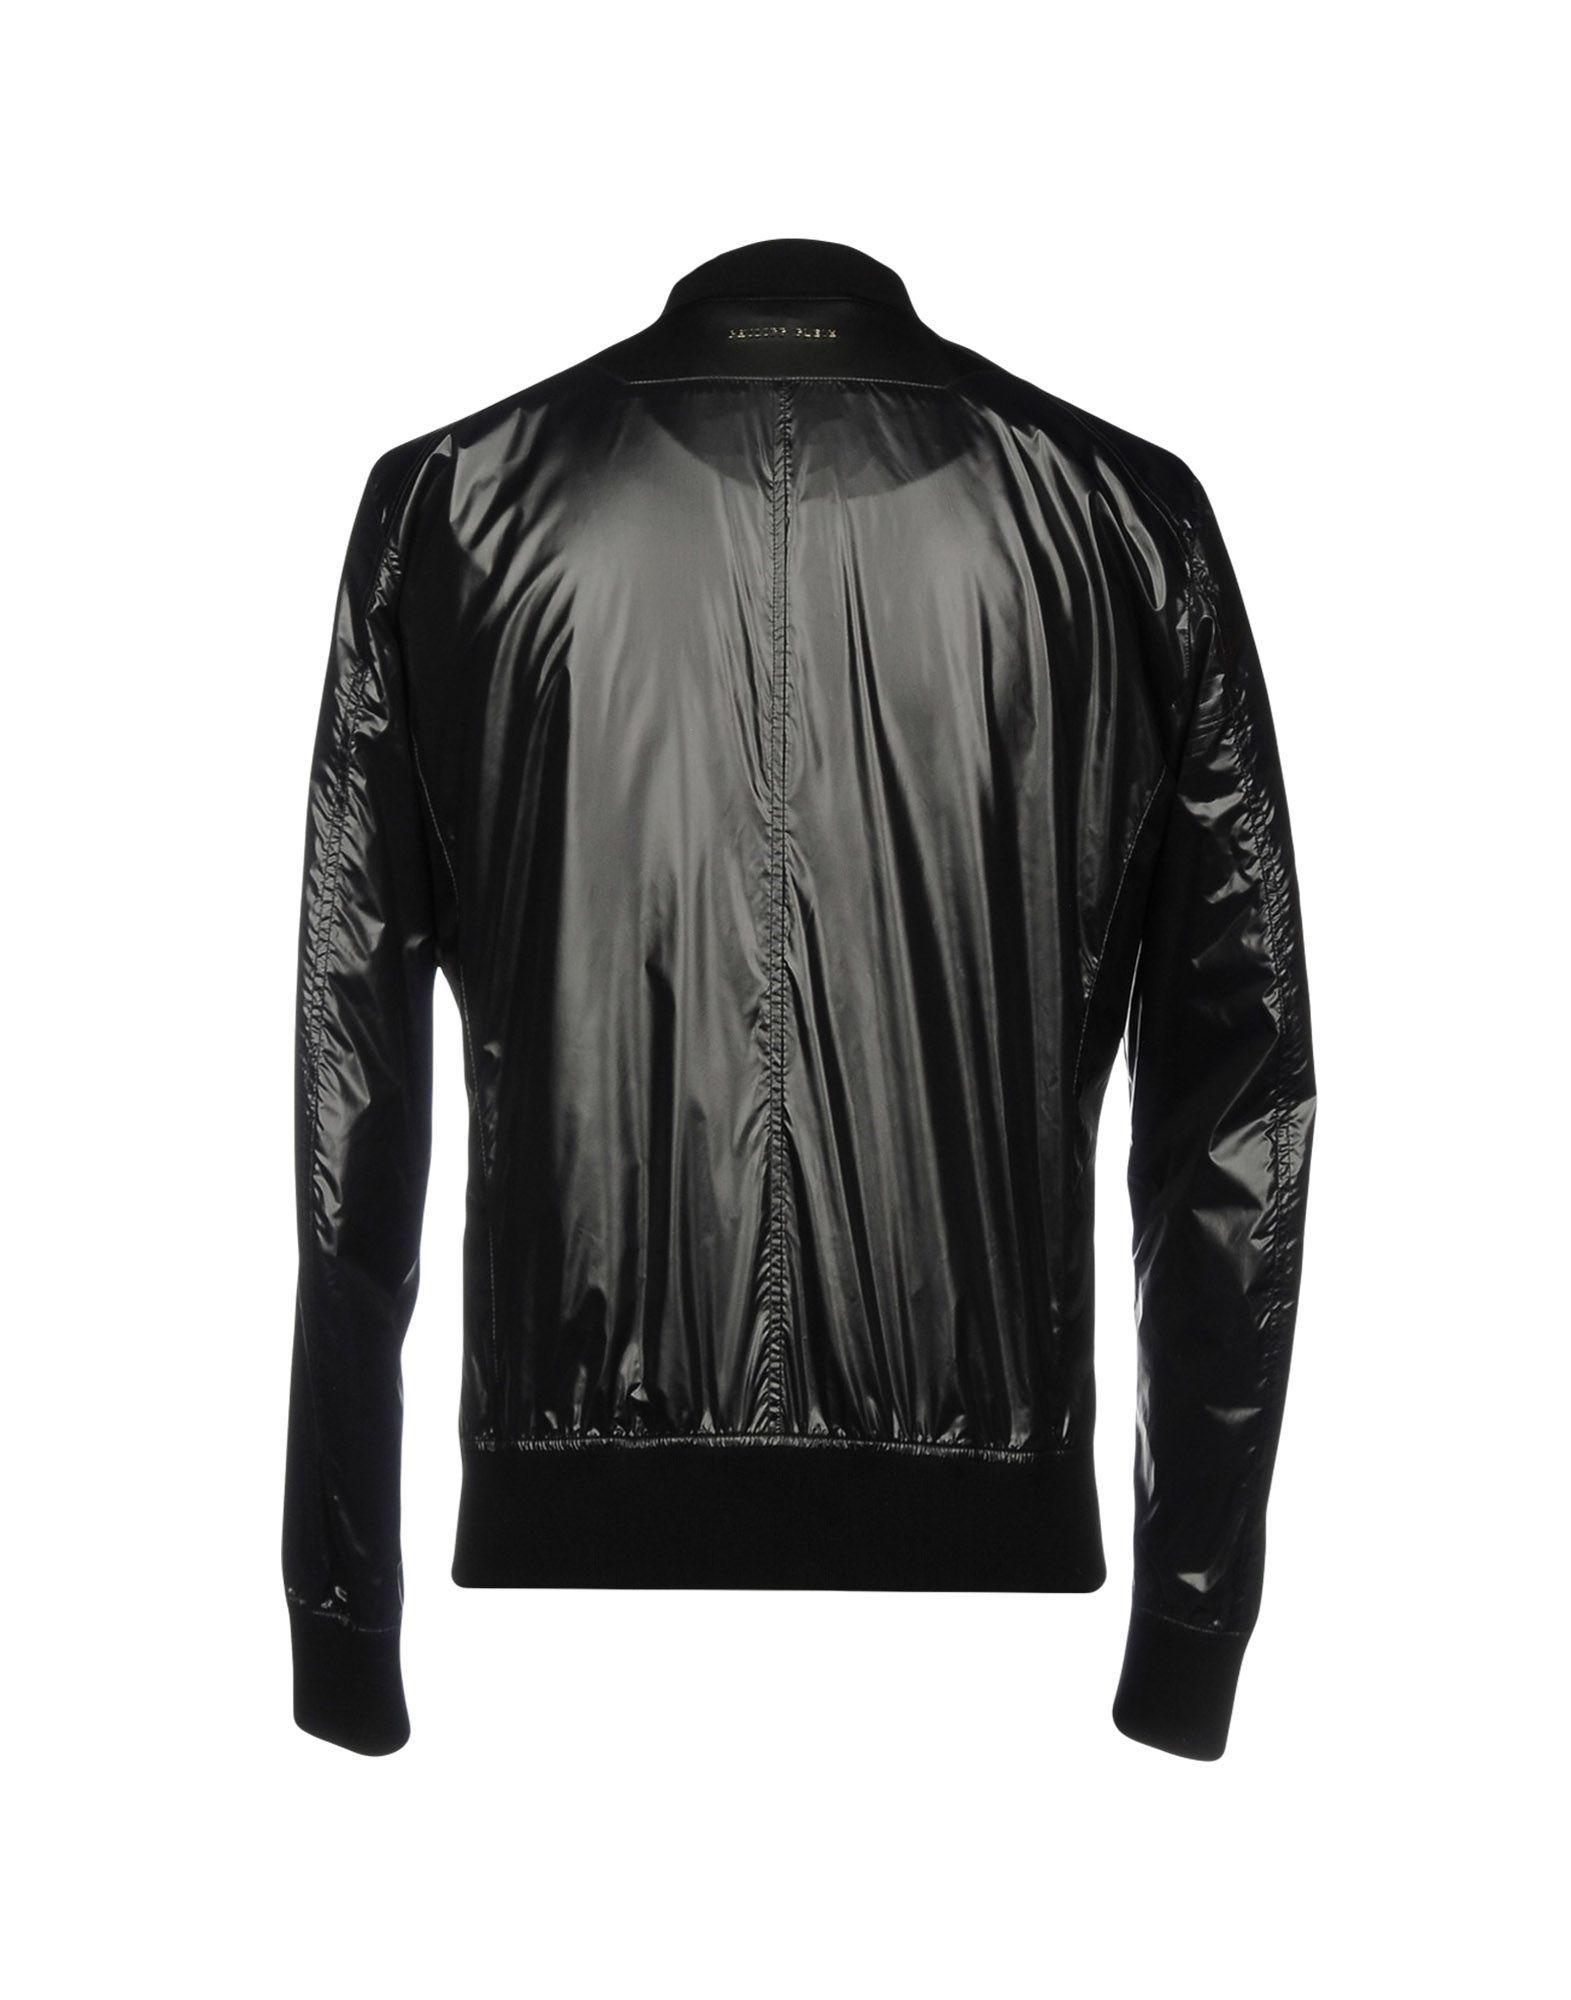 Philipp Plein Synthetic Jackets in Black for Men